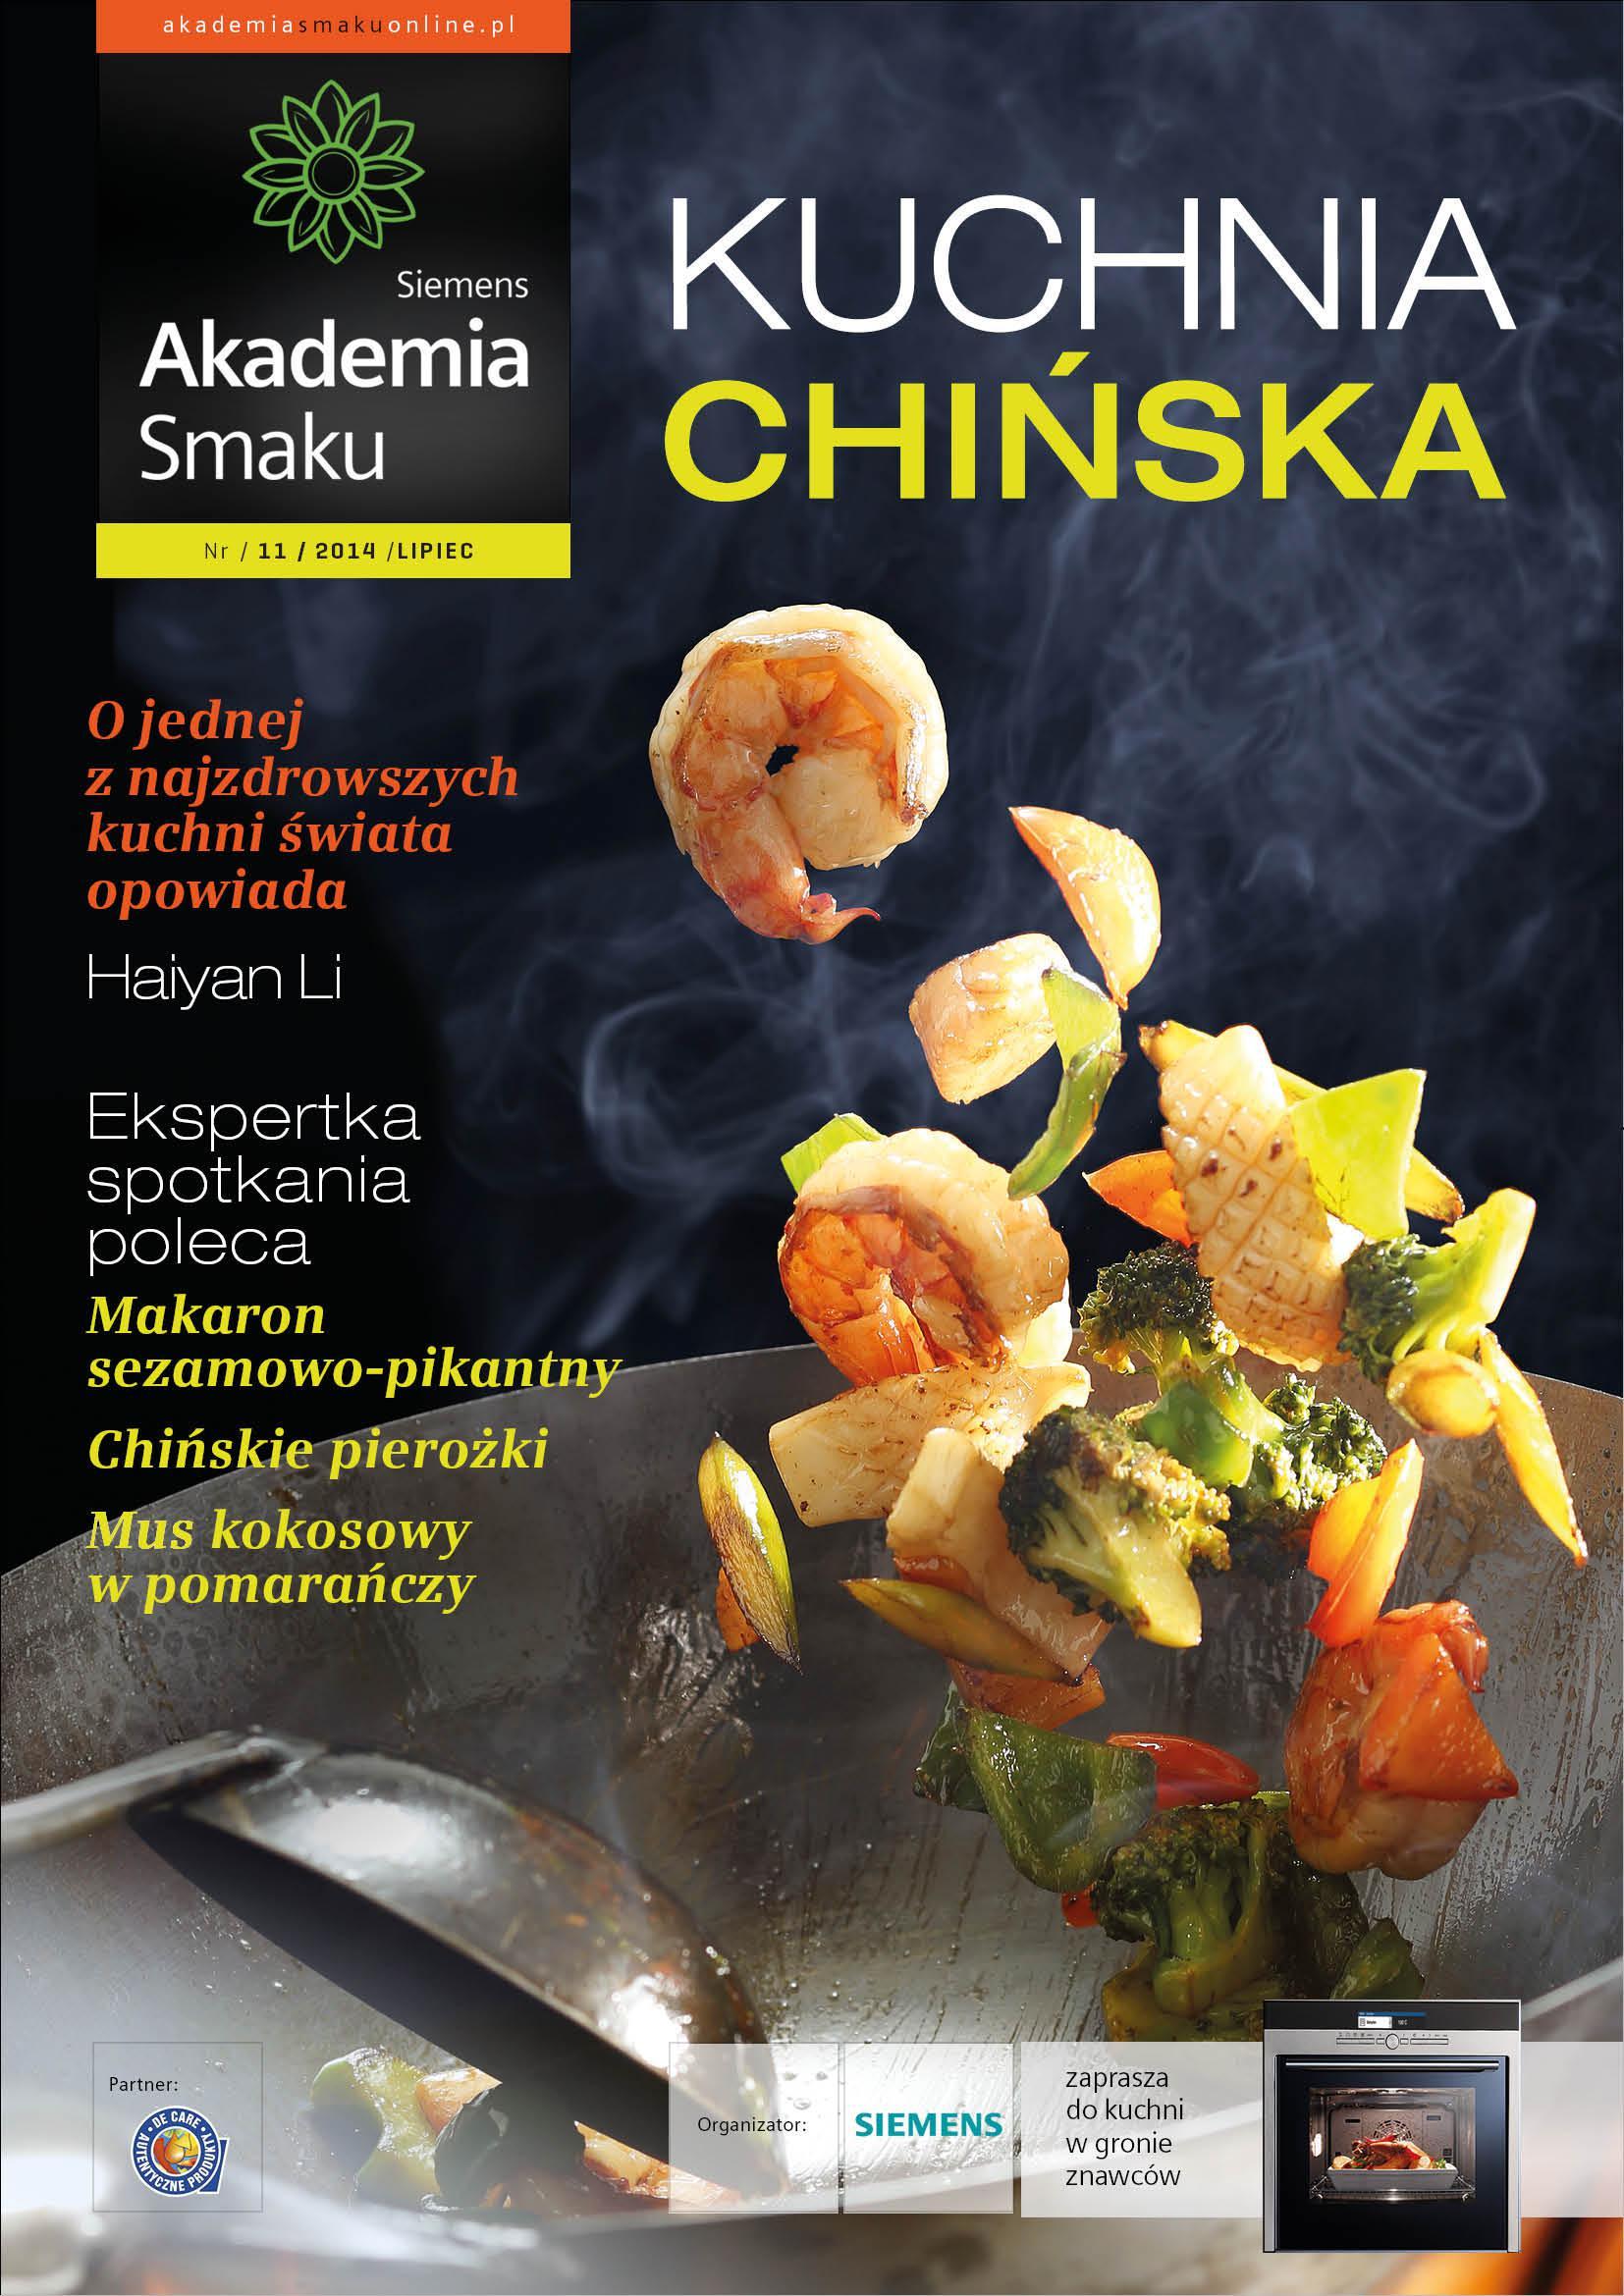 Kuchnia chińska - Strona 1